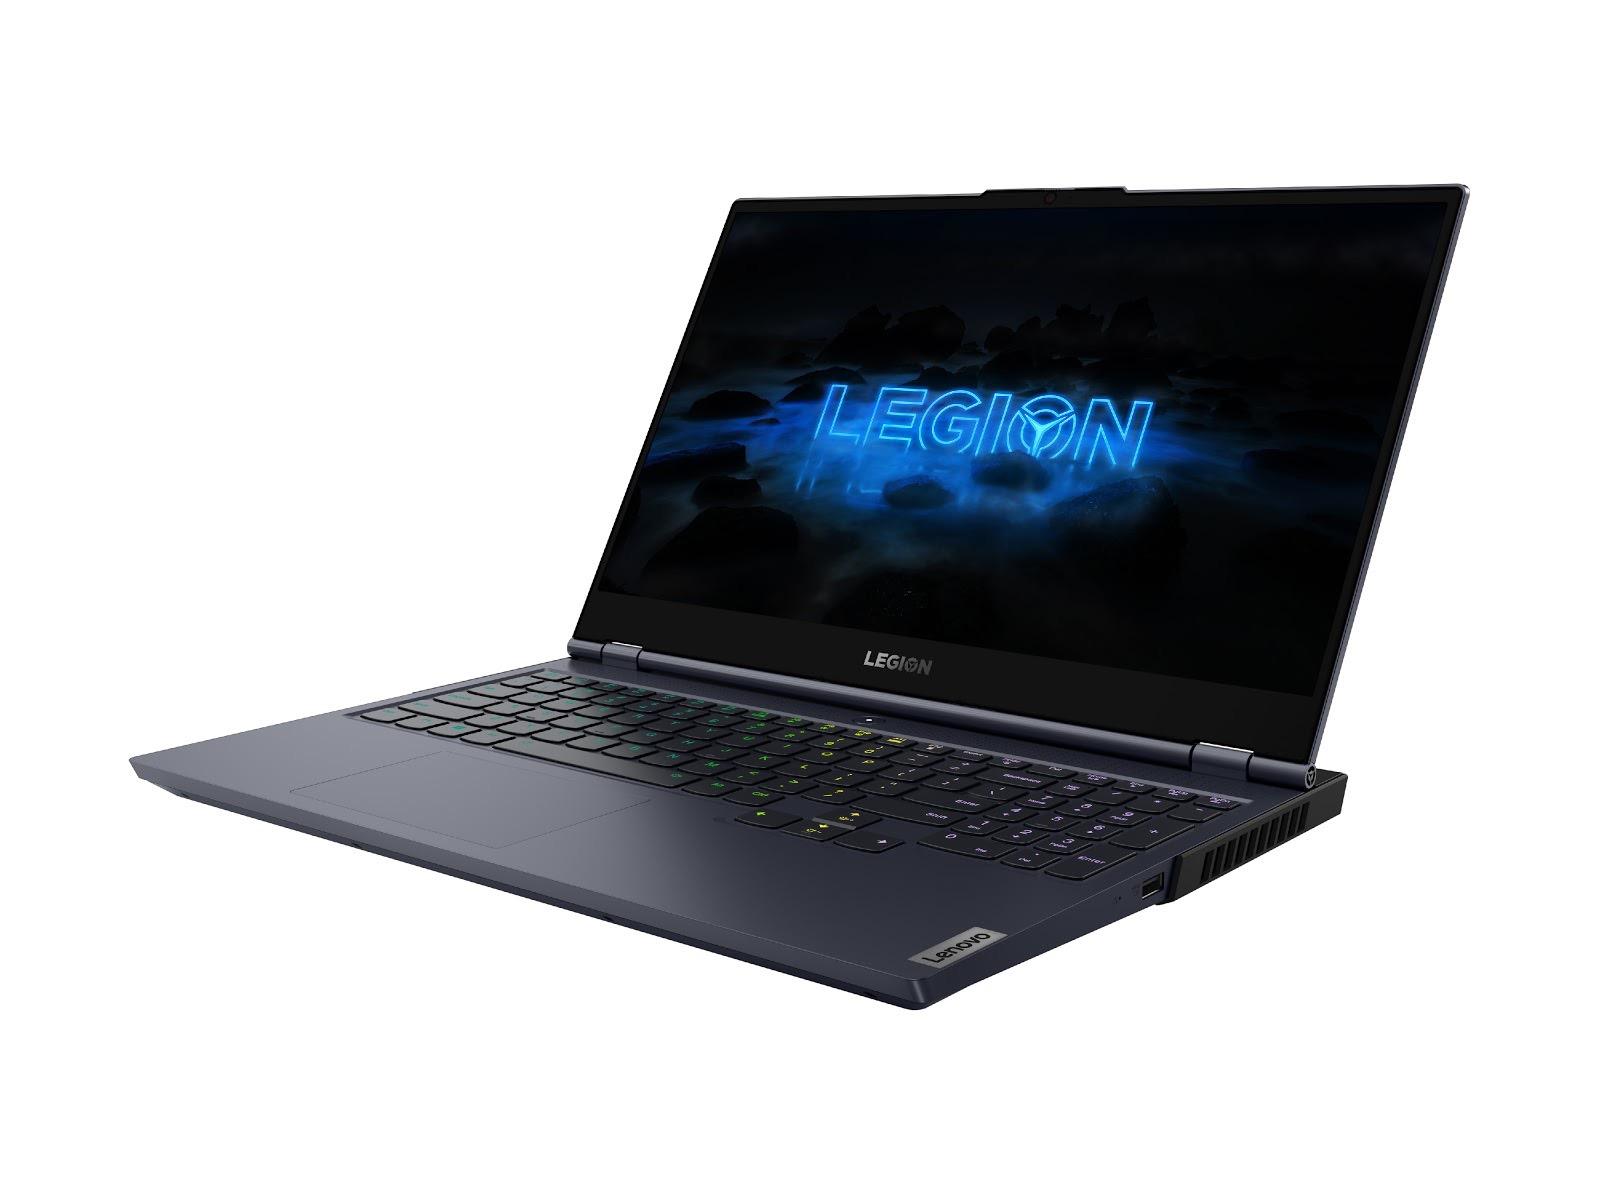 Фото 1. Ноутбук Lenovo Legion 7i 15IMHg05 Slate grey (81YU0077RK)